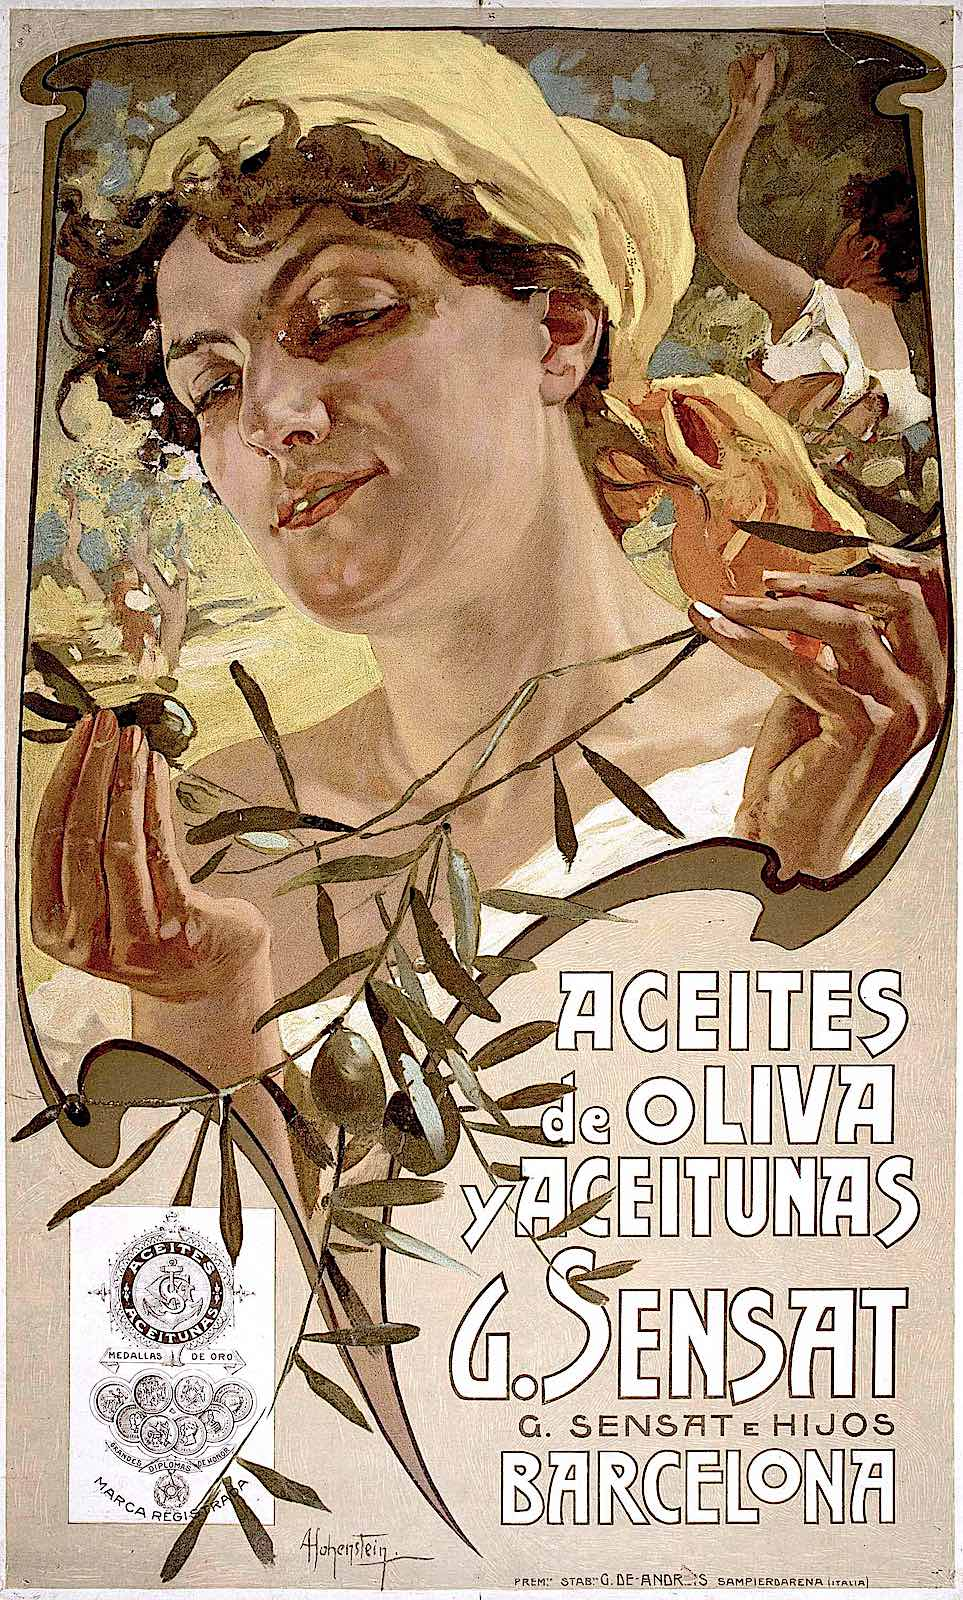 a poster illustration by Adolf Hohenstein, Aceites de Oliva yAceitunas G. Sensat E Hijos Barcelona